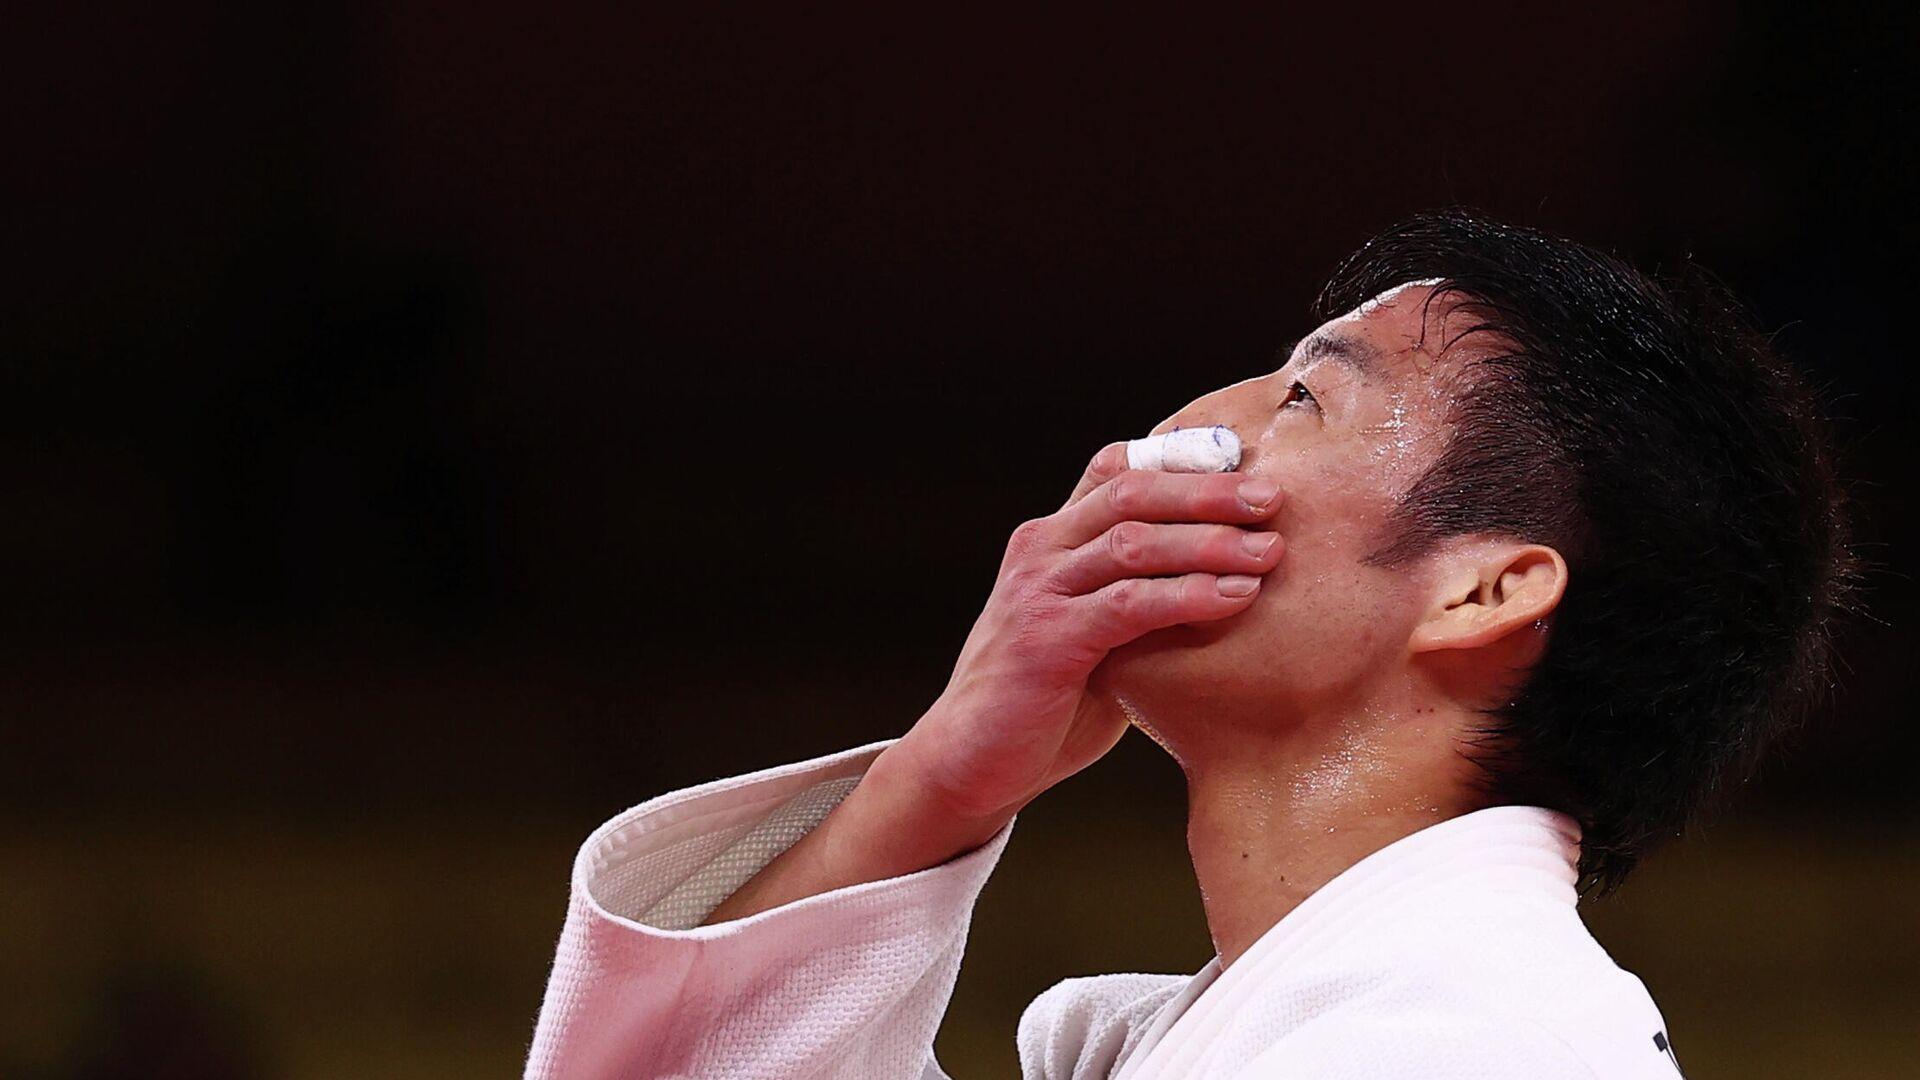 Японский дзюдоист Таканори Нагасэ - РИА Новости, 1920, 27.07.2021